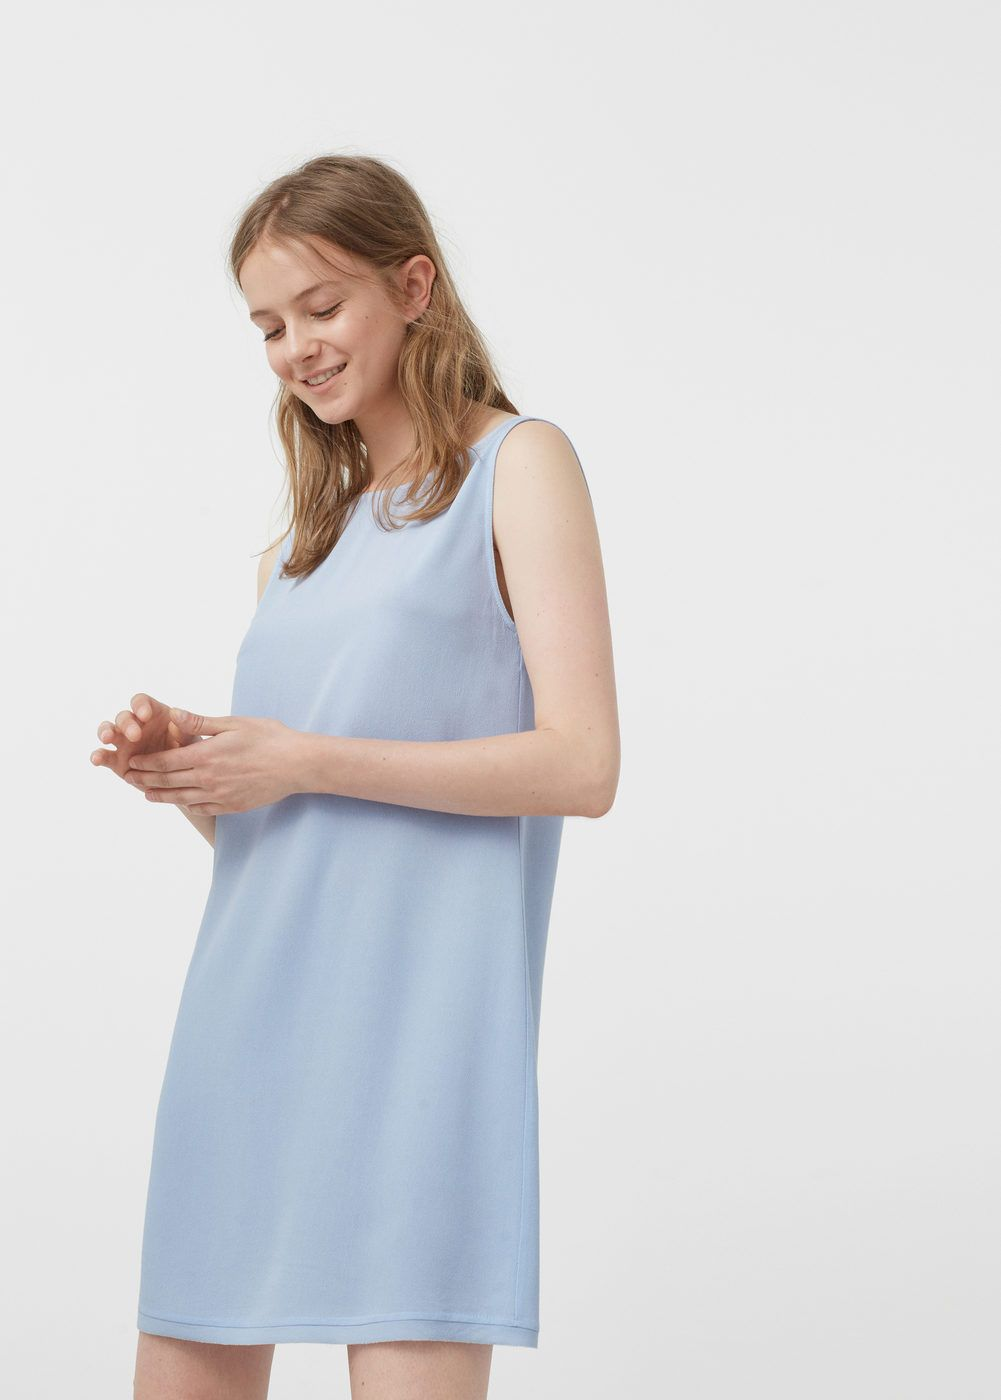 304a2940d Vestido fluido - Vestidos de Mujer | MANGO España Todo Fluye, Cuello Redondo,  Tirantes